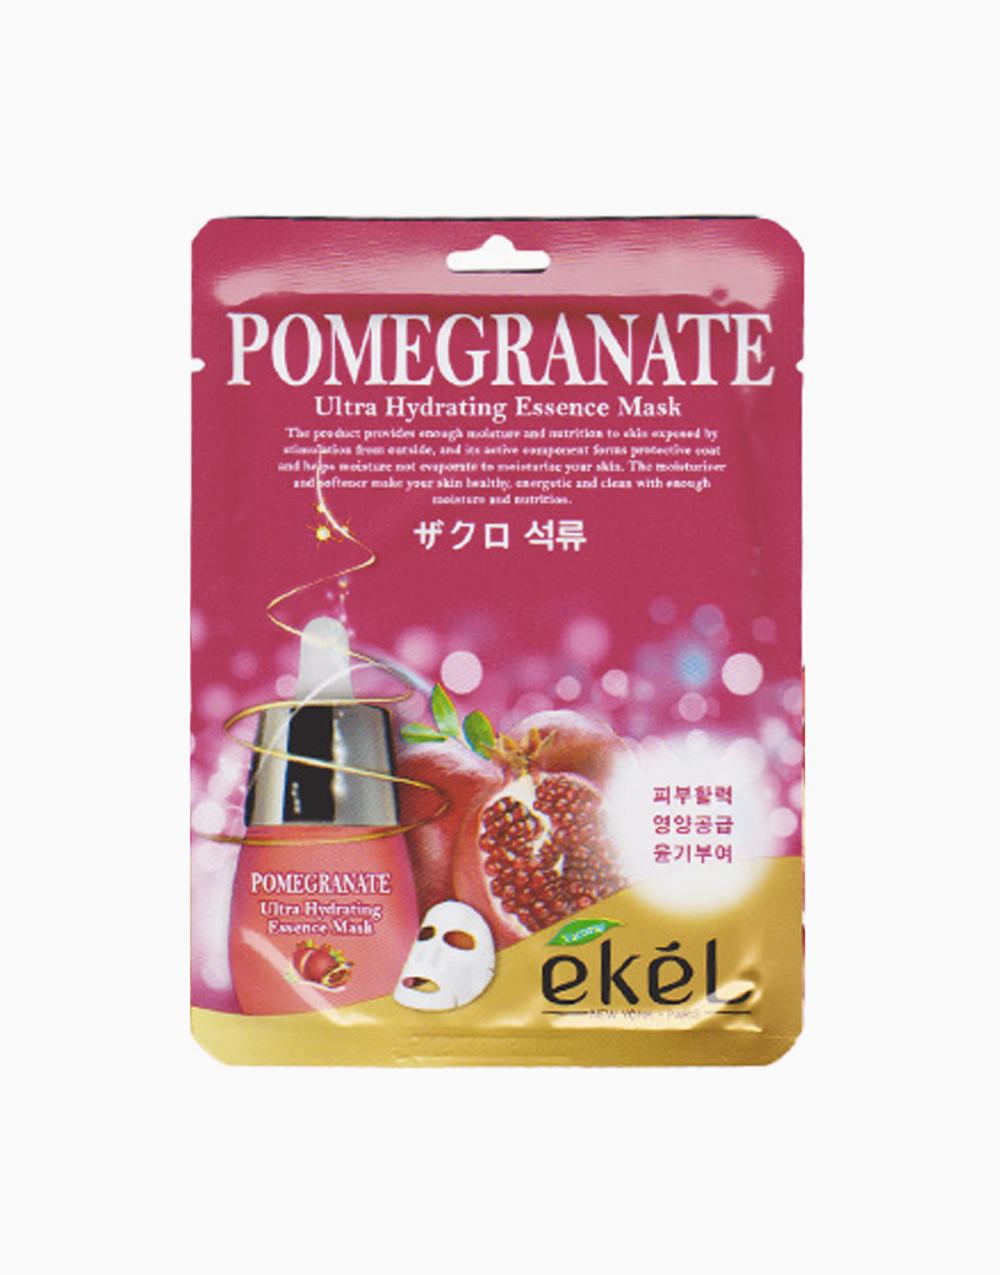 Pomegranate Mask by Ekel